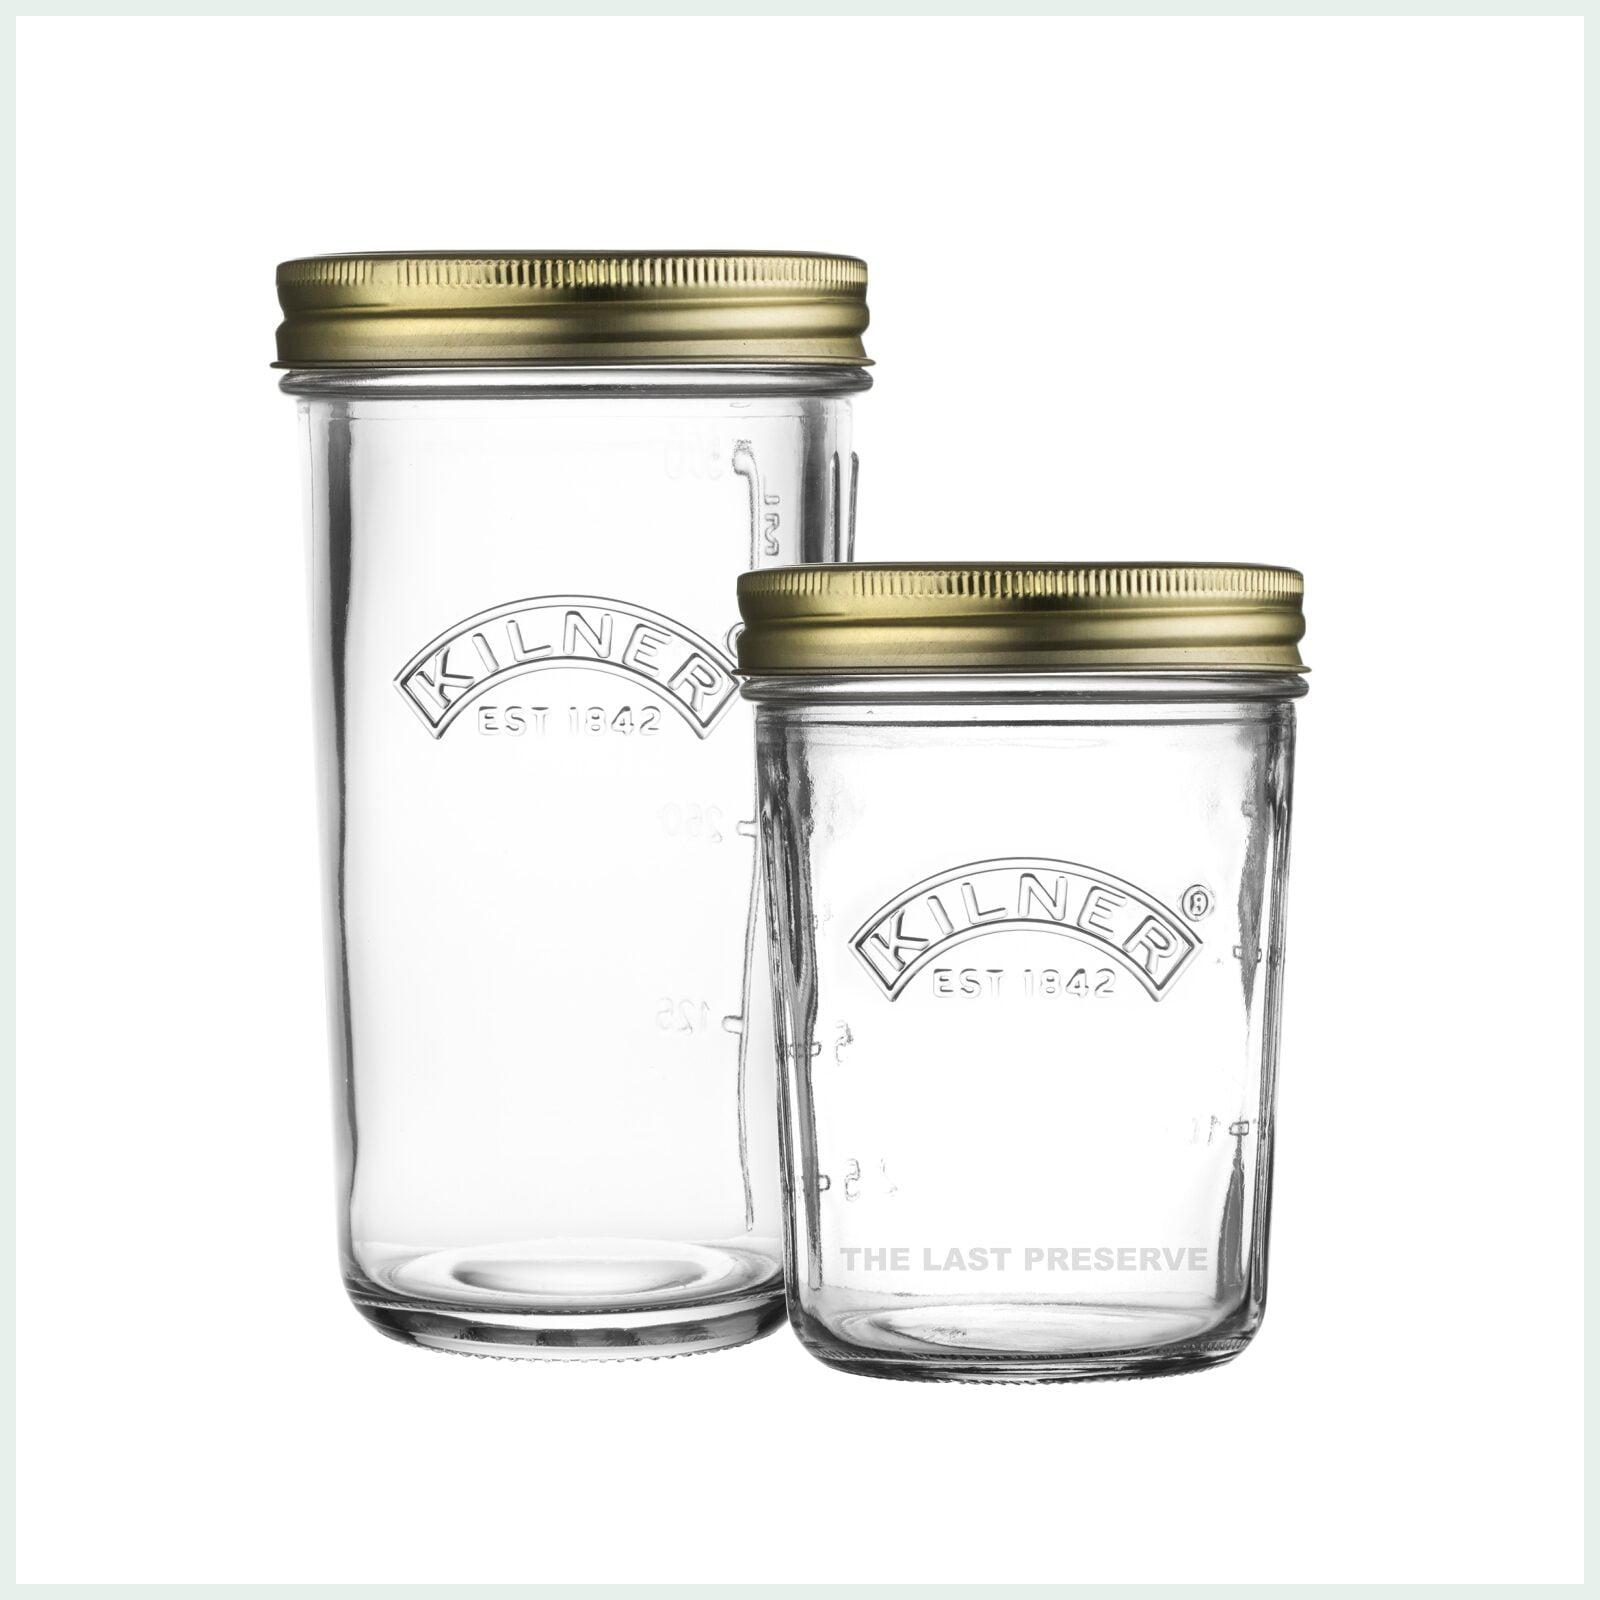 Kilner wide mouth preserve jars for canning and jam making